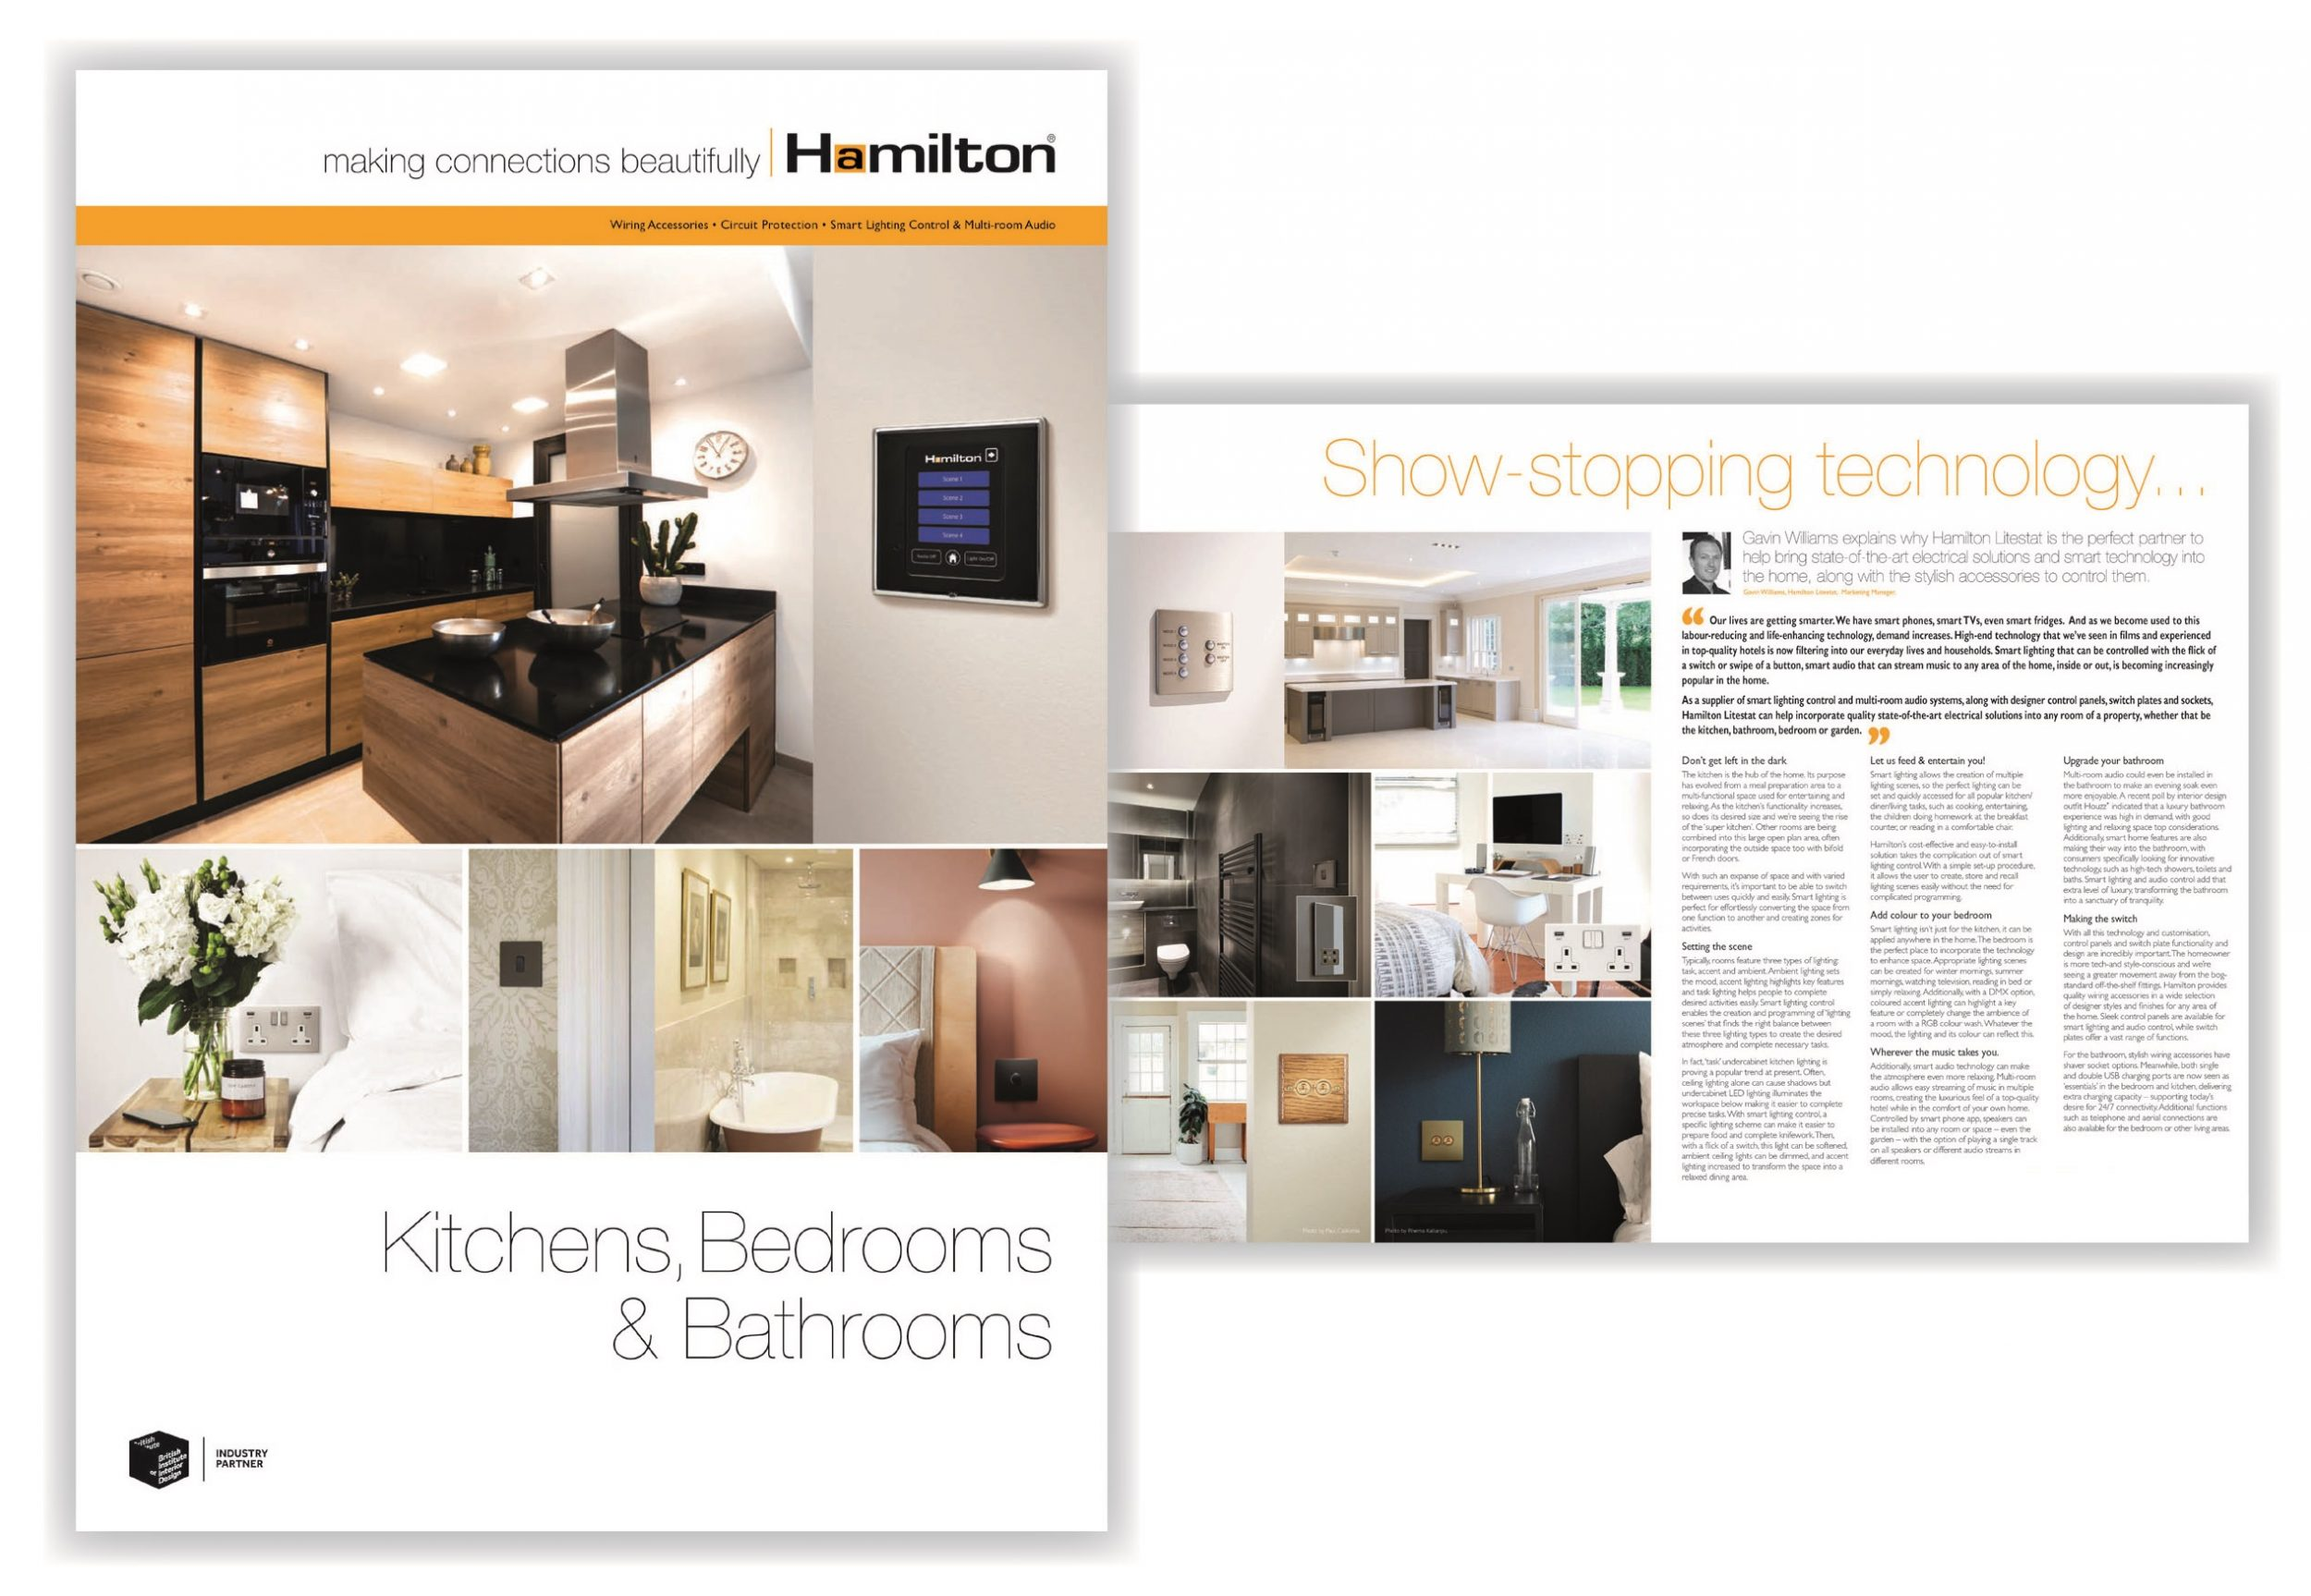 hamilton launches new brochure